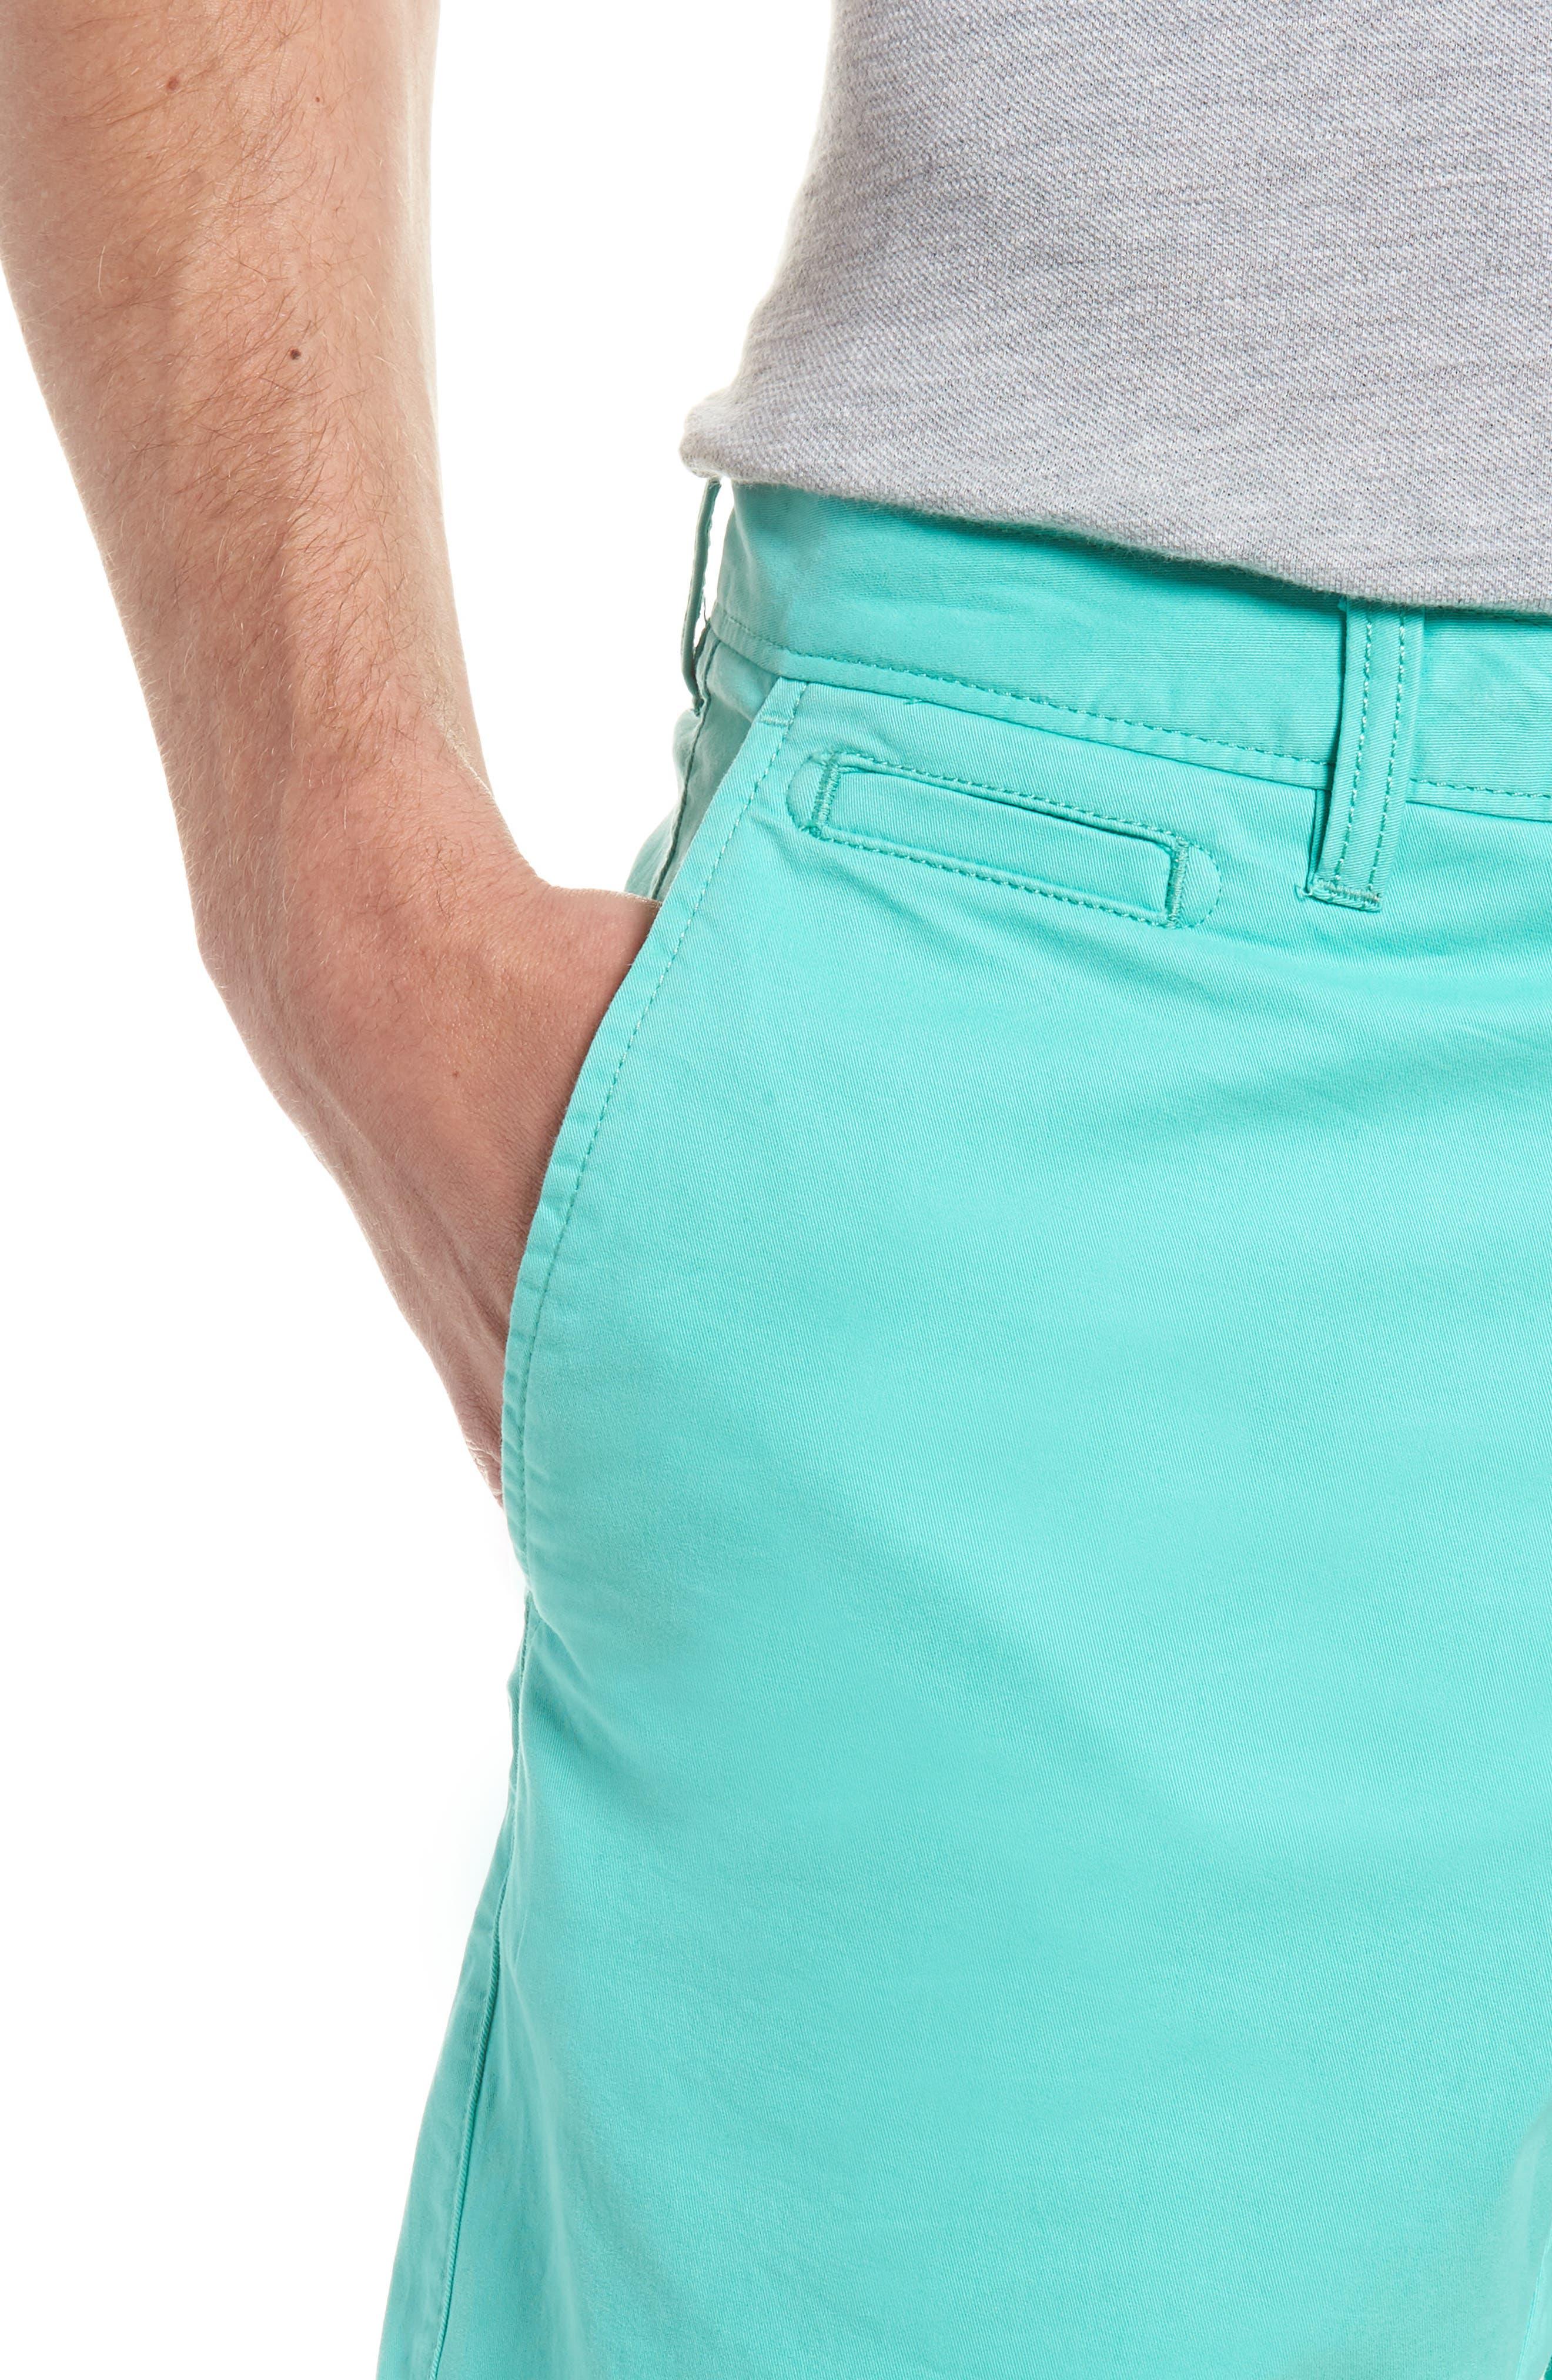 Ballard Slim Fit Stretch Chino 9-Inch Shorts,                             Alternate thumbnail 4, color,                             Green Largo